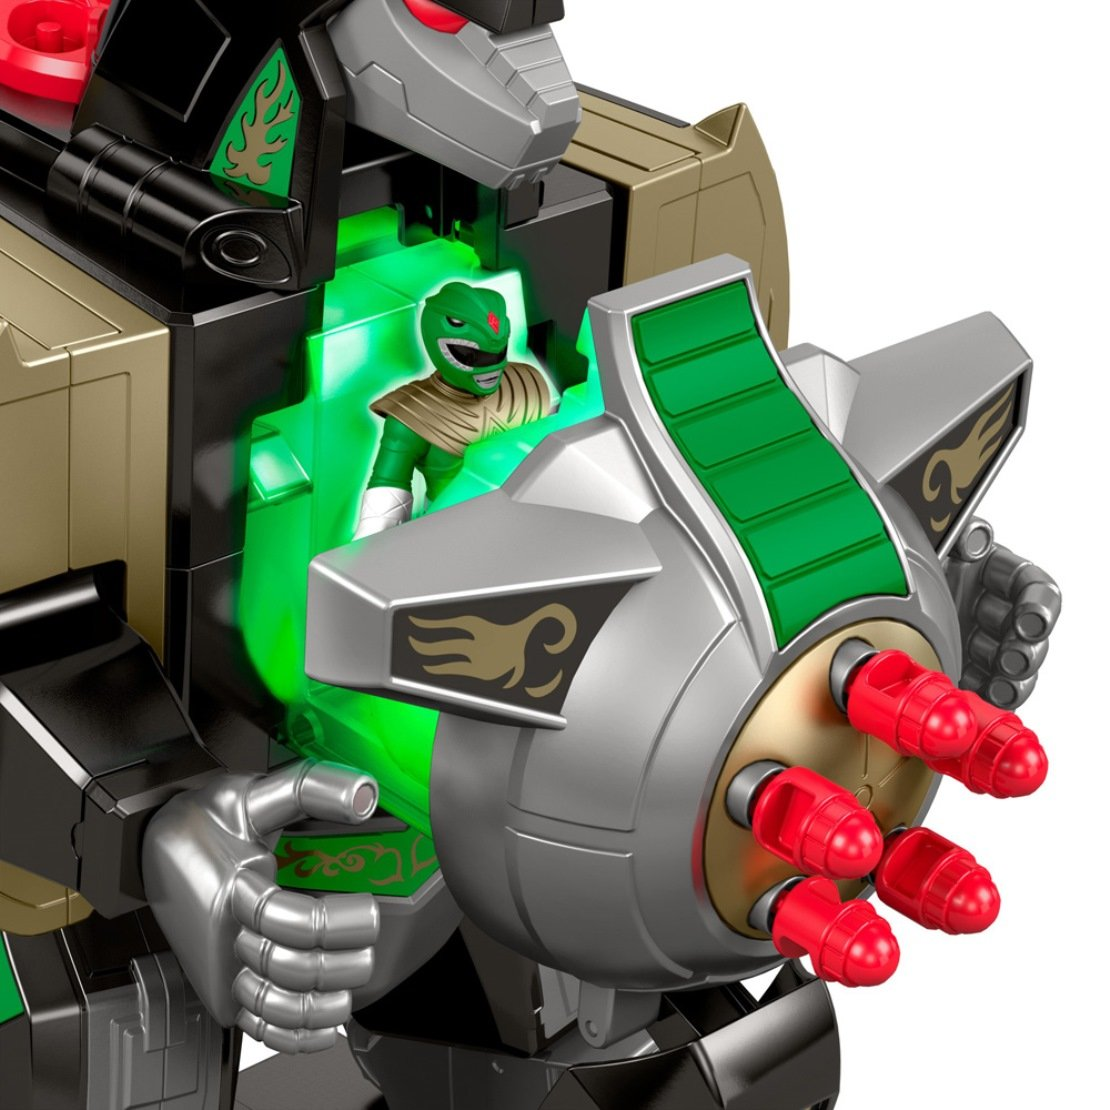 Fisher-Price Imaginext Power Rangers Green Ranger /& Dragonzord Rc